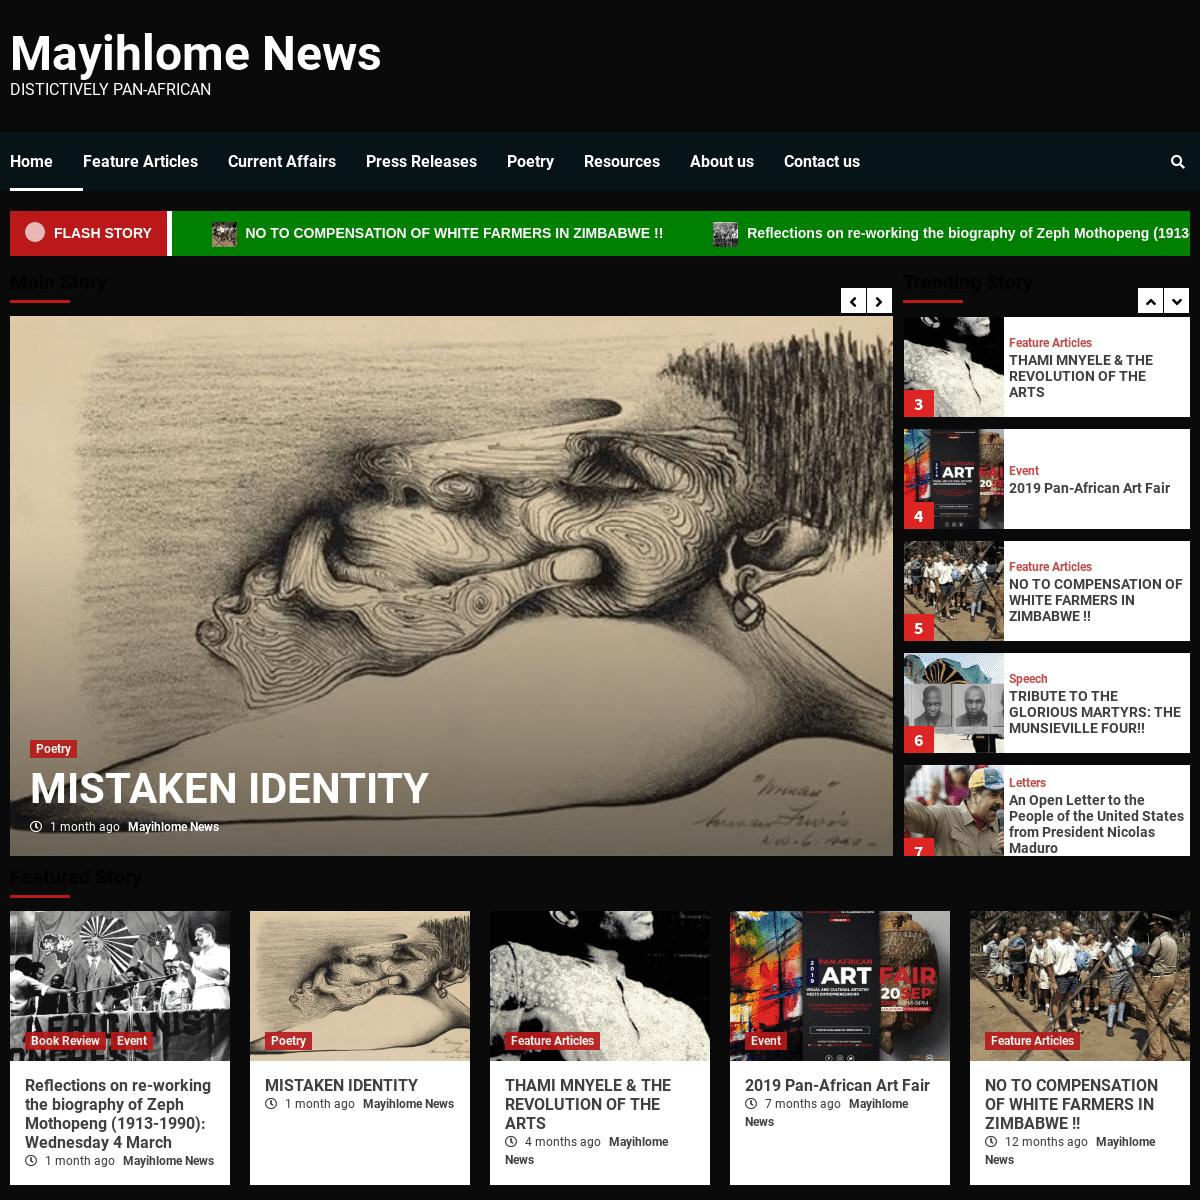 Mayihlome News – Distictively Pan-African